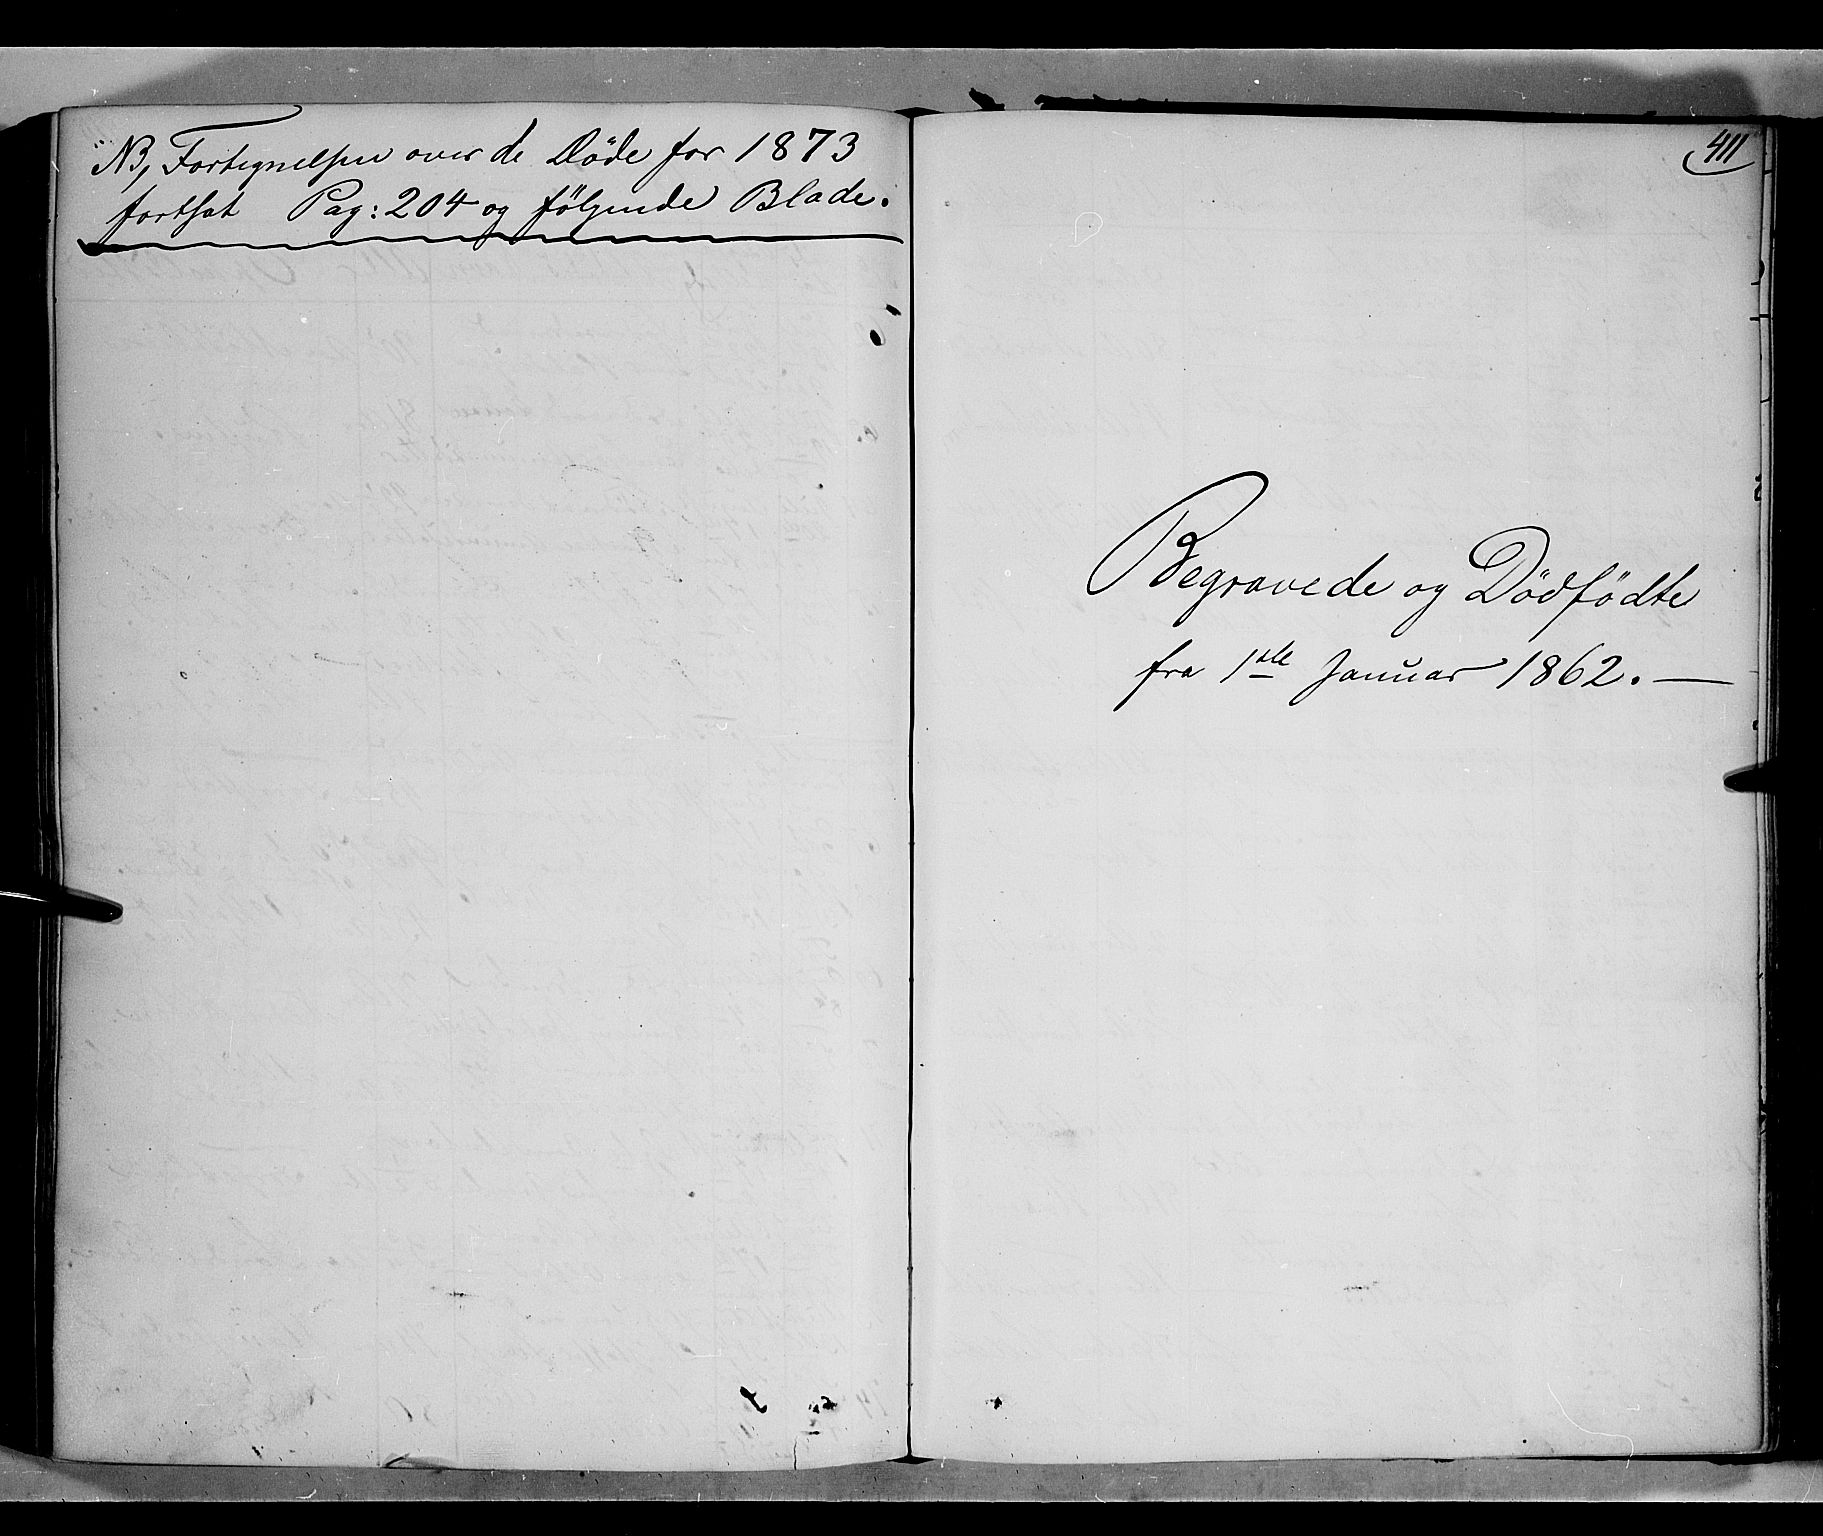 SAH, Gausdal prestekontor, Ministerialbok nr. 9, 1862-1873, s. 411